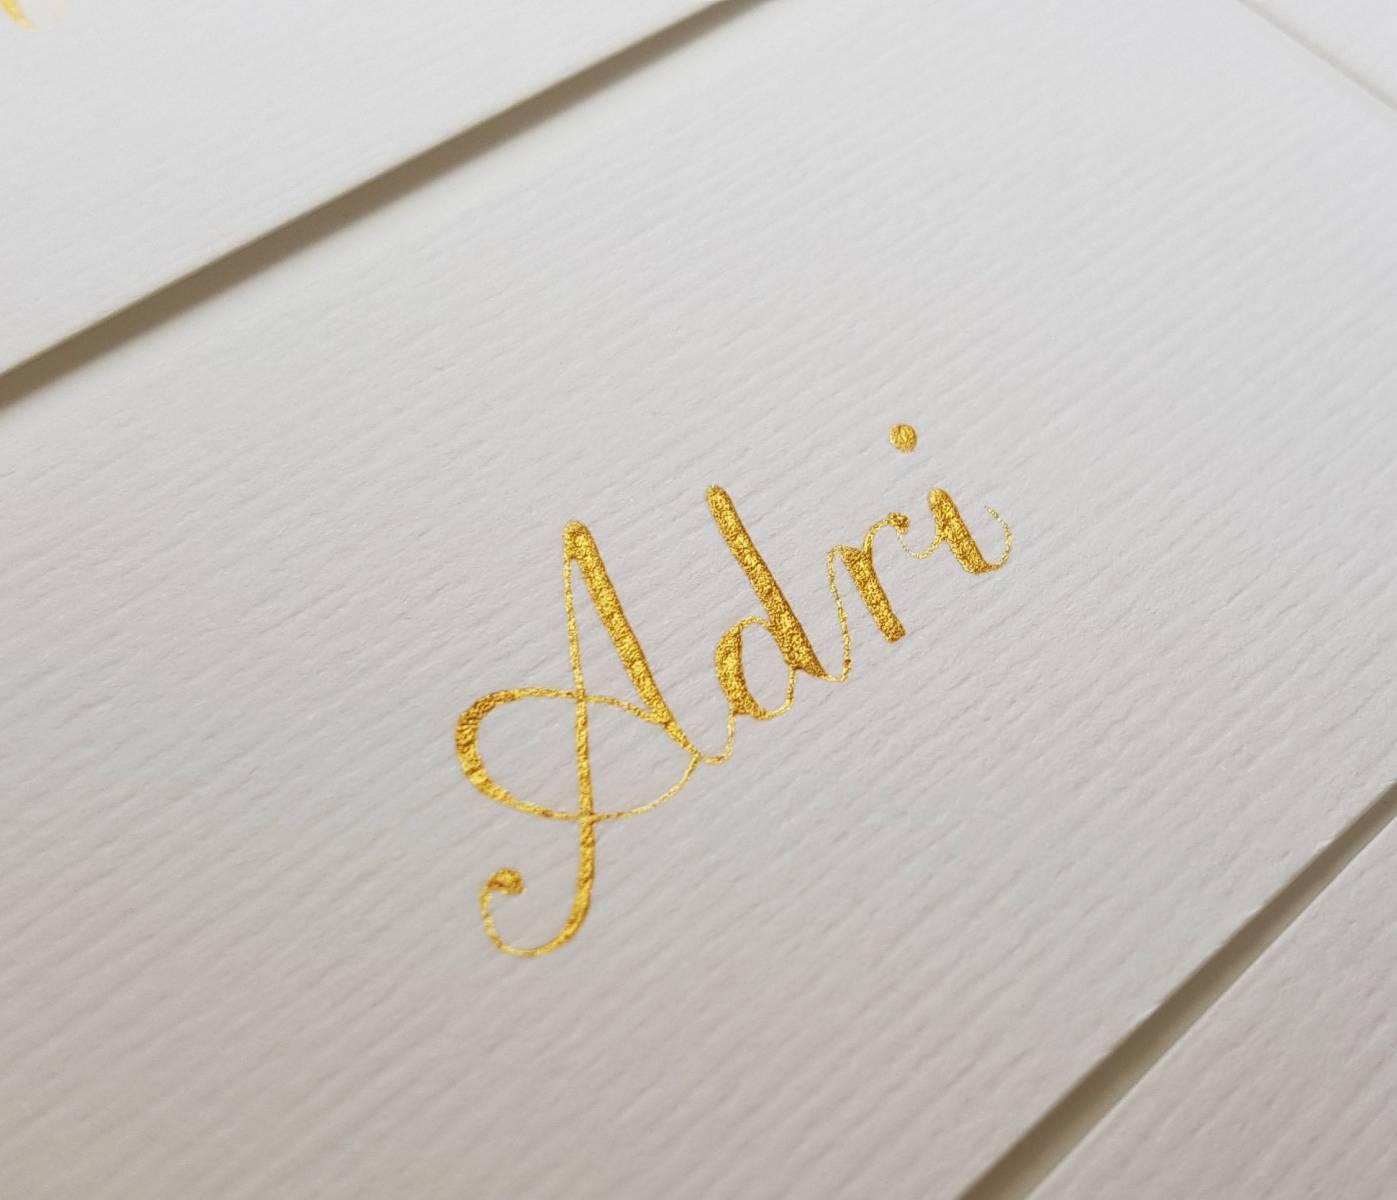 Touch of Gold - Workshops - Vrijgezellen - Trouwuitnodiging - Huwelijksuitnodiging - Kalligrafie - House of Weddings - 2